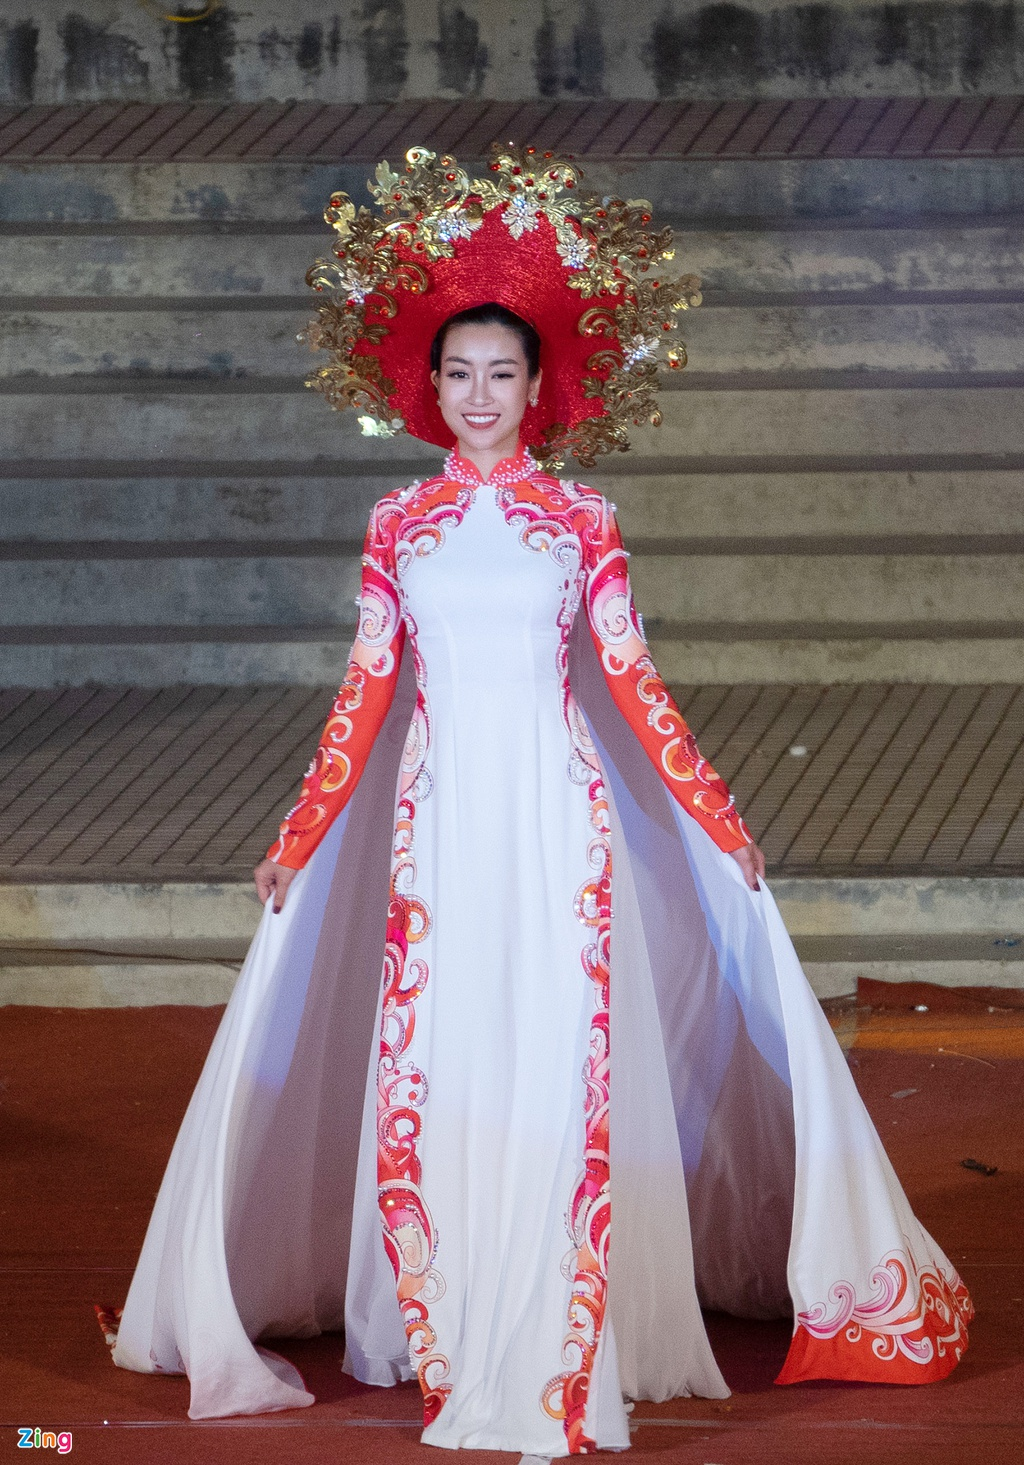 trinh dien ao dai tai Festival Hue anh 2